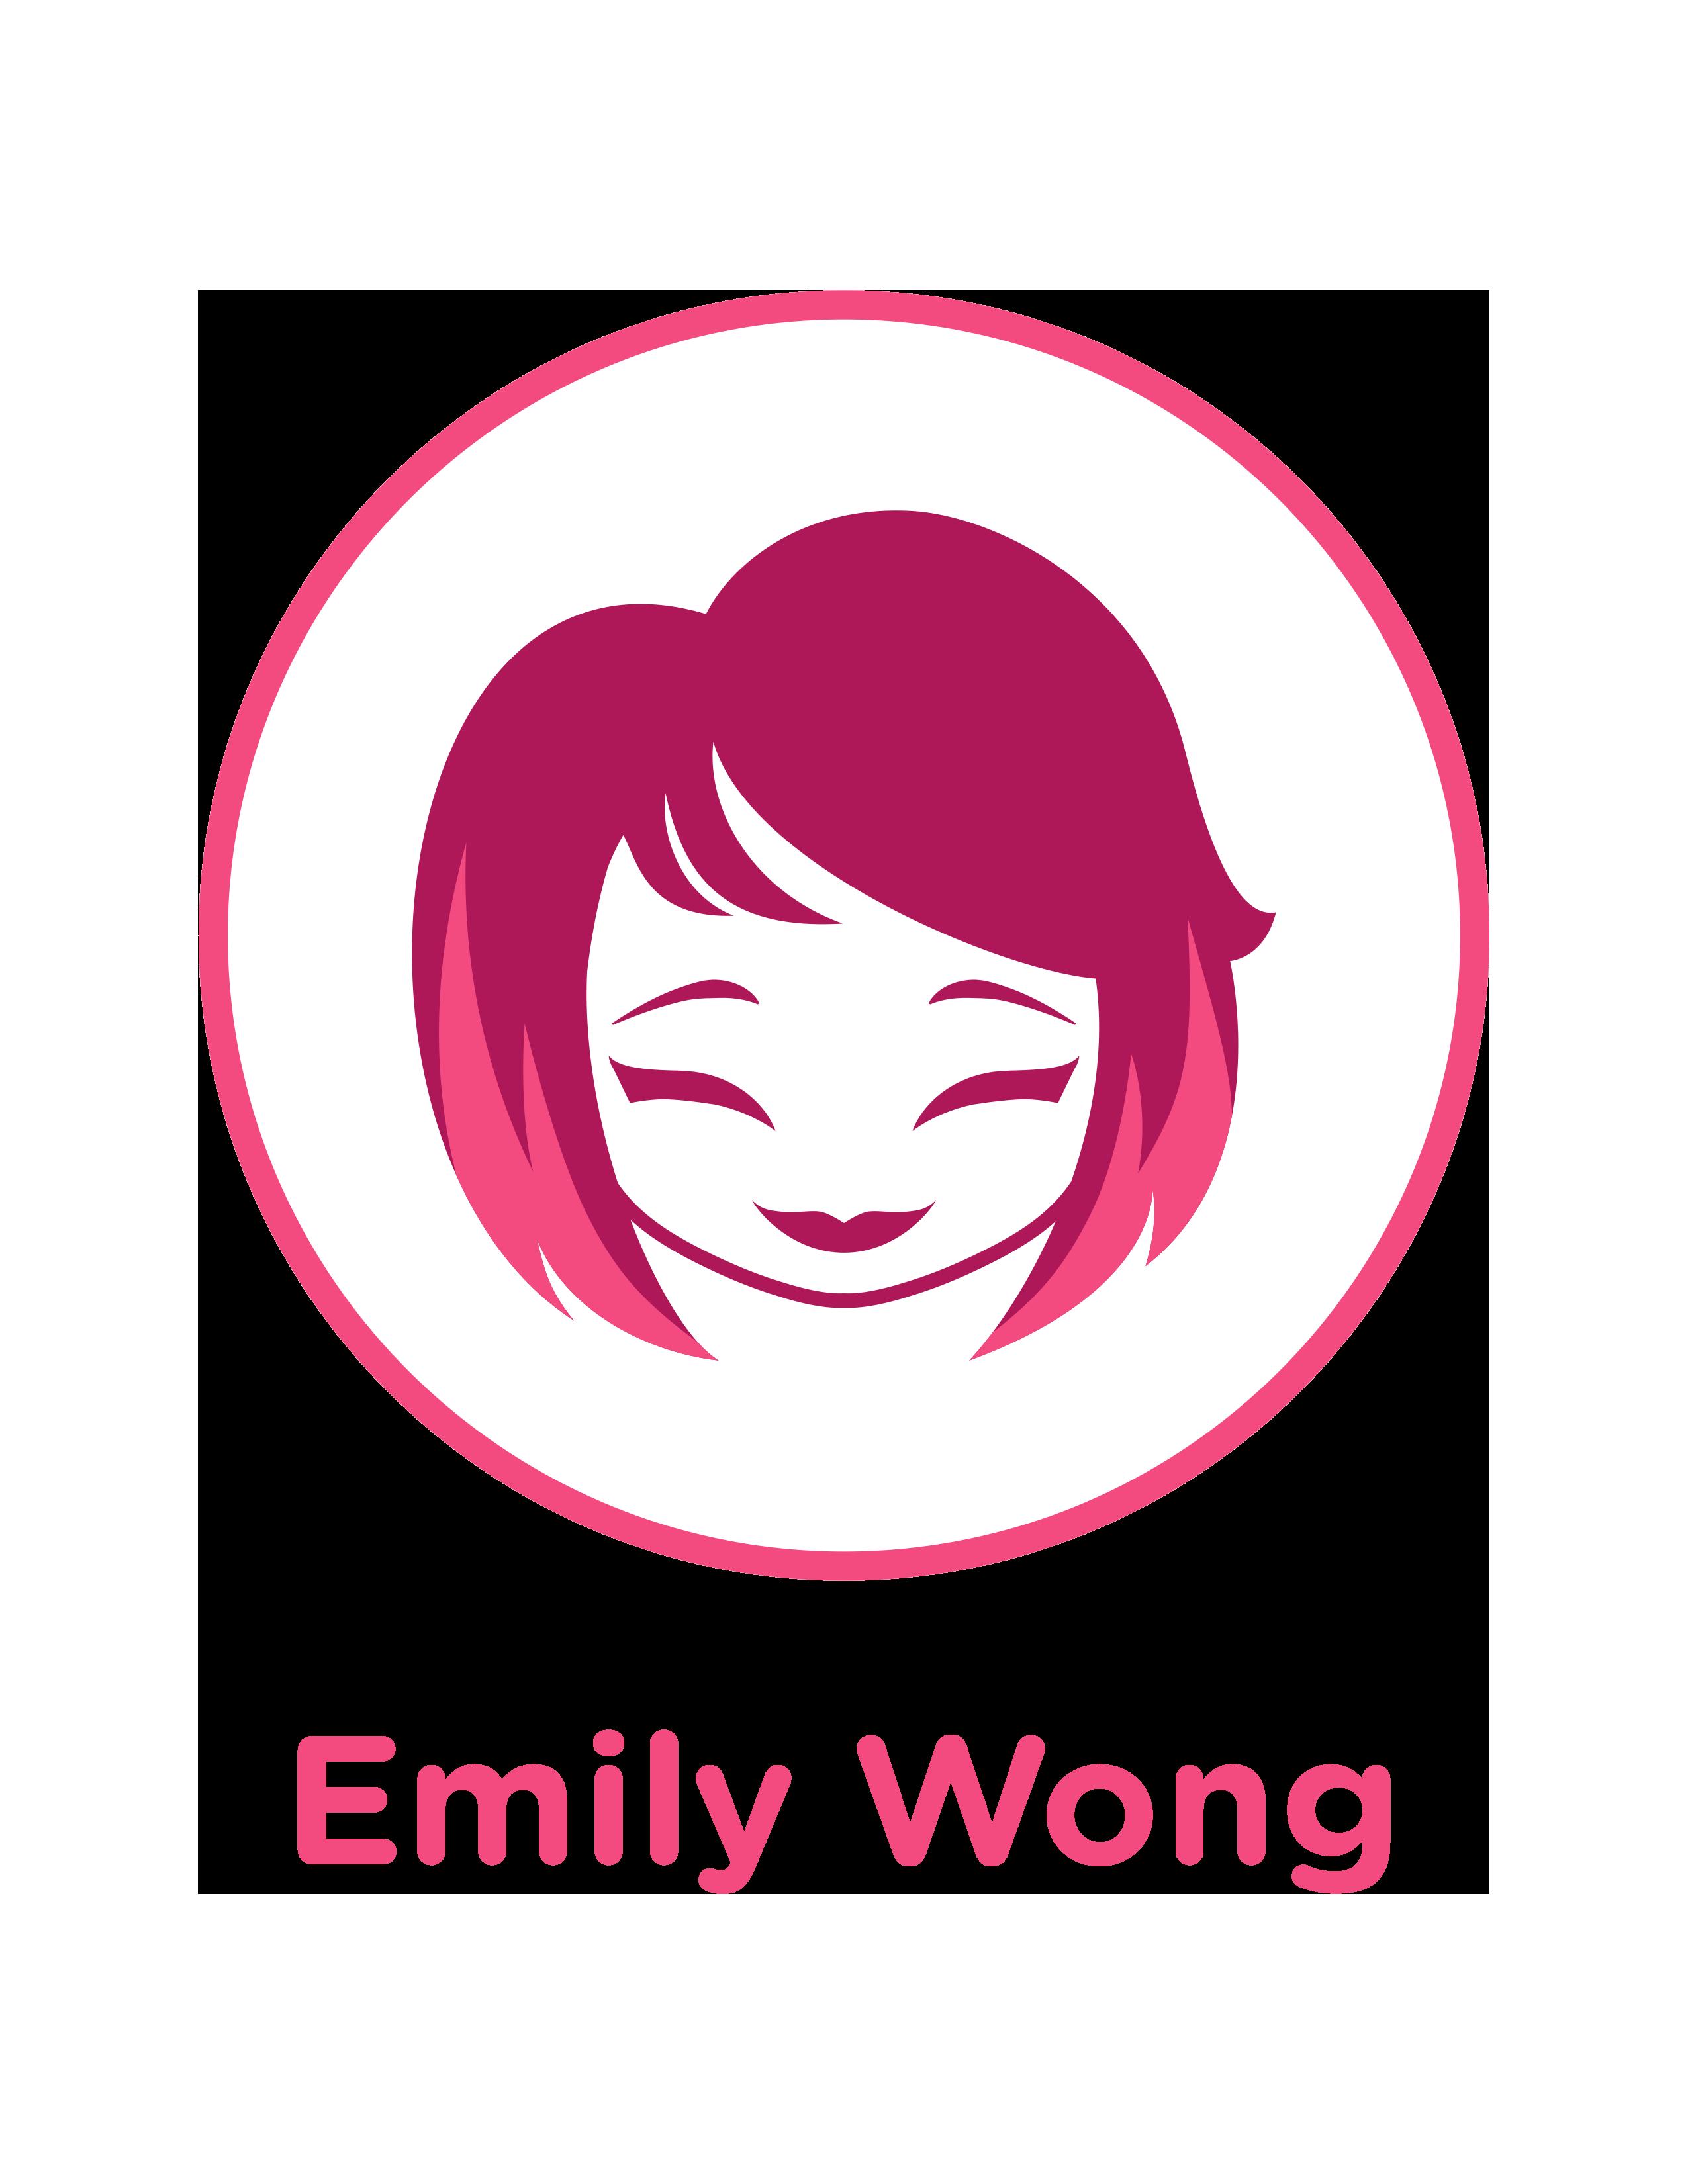 Emmy Wong